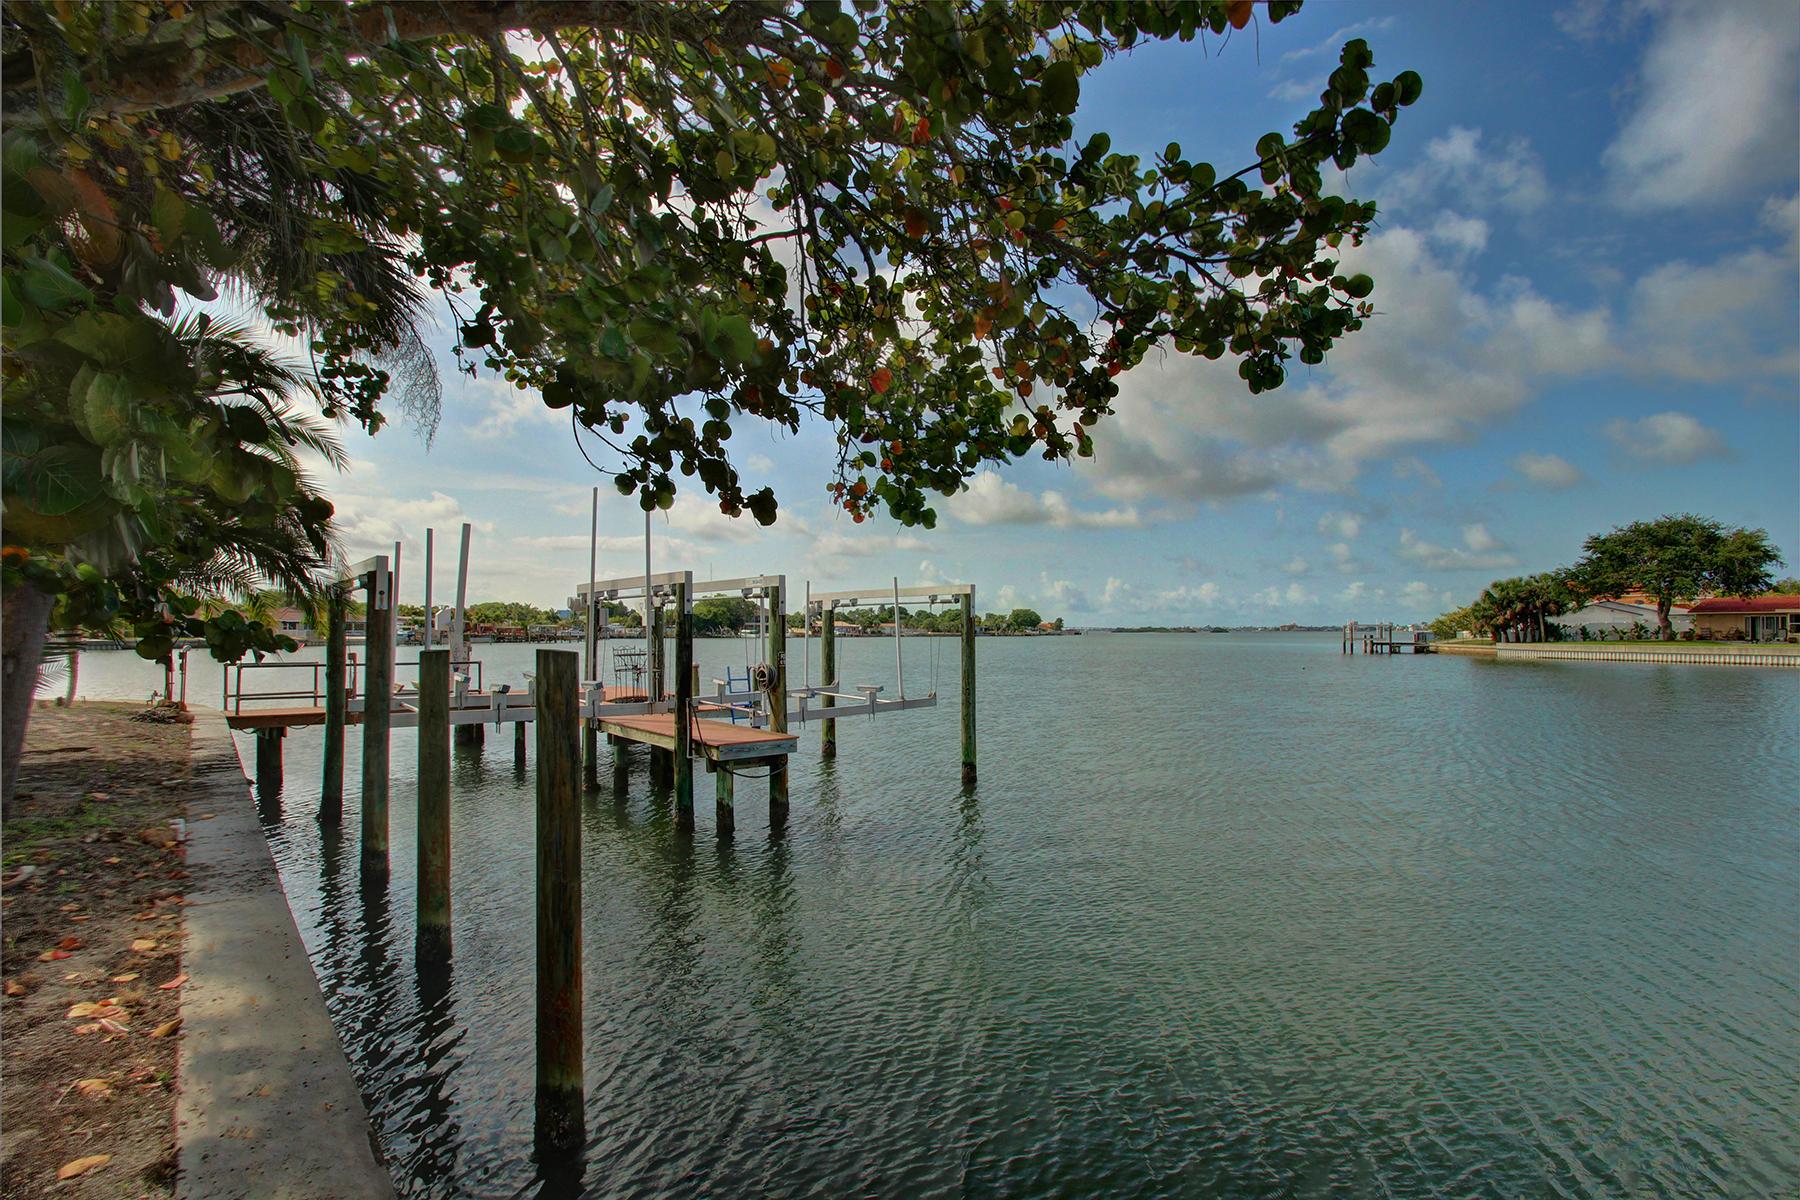 Land for Sale at ST. PETERSBURG 6503 Debbie Ln S 1 St. Petersburg, Florida 33707 United States